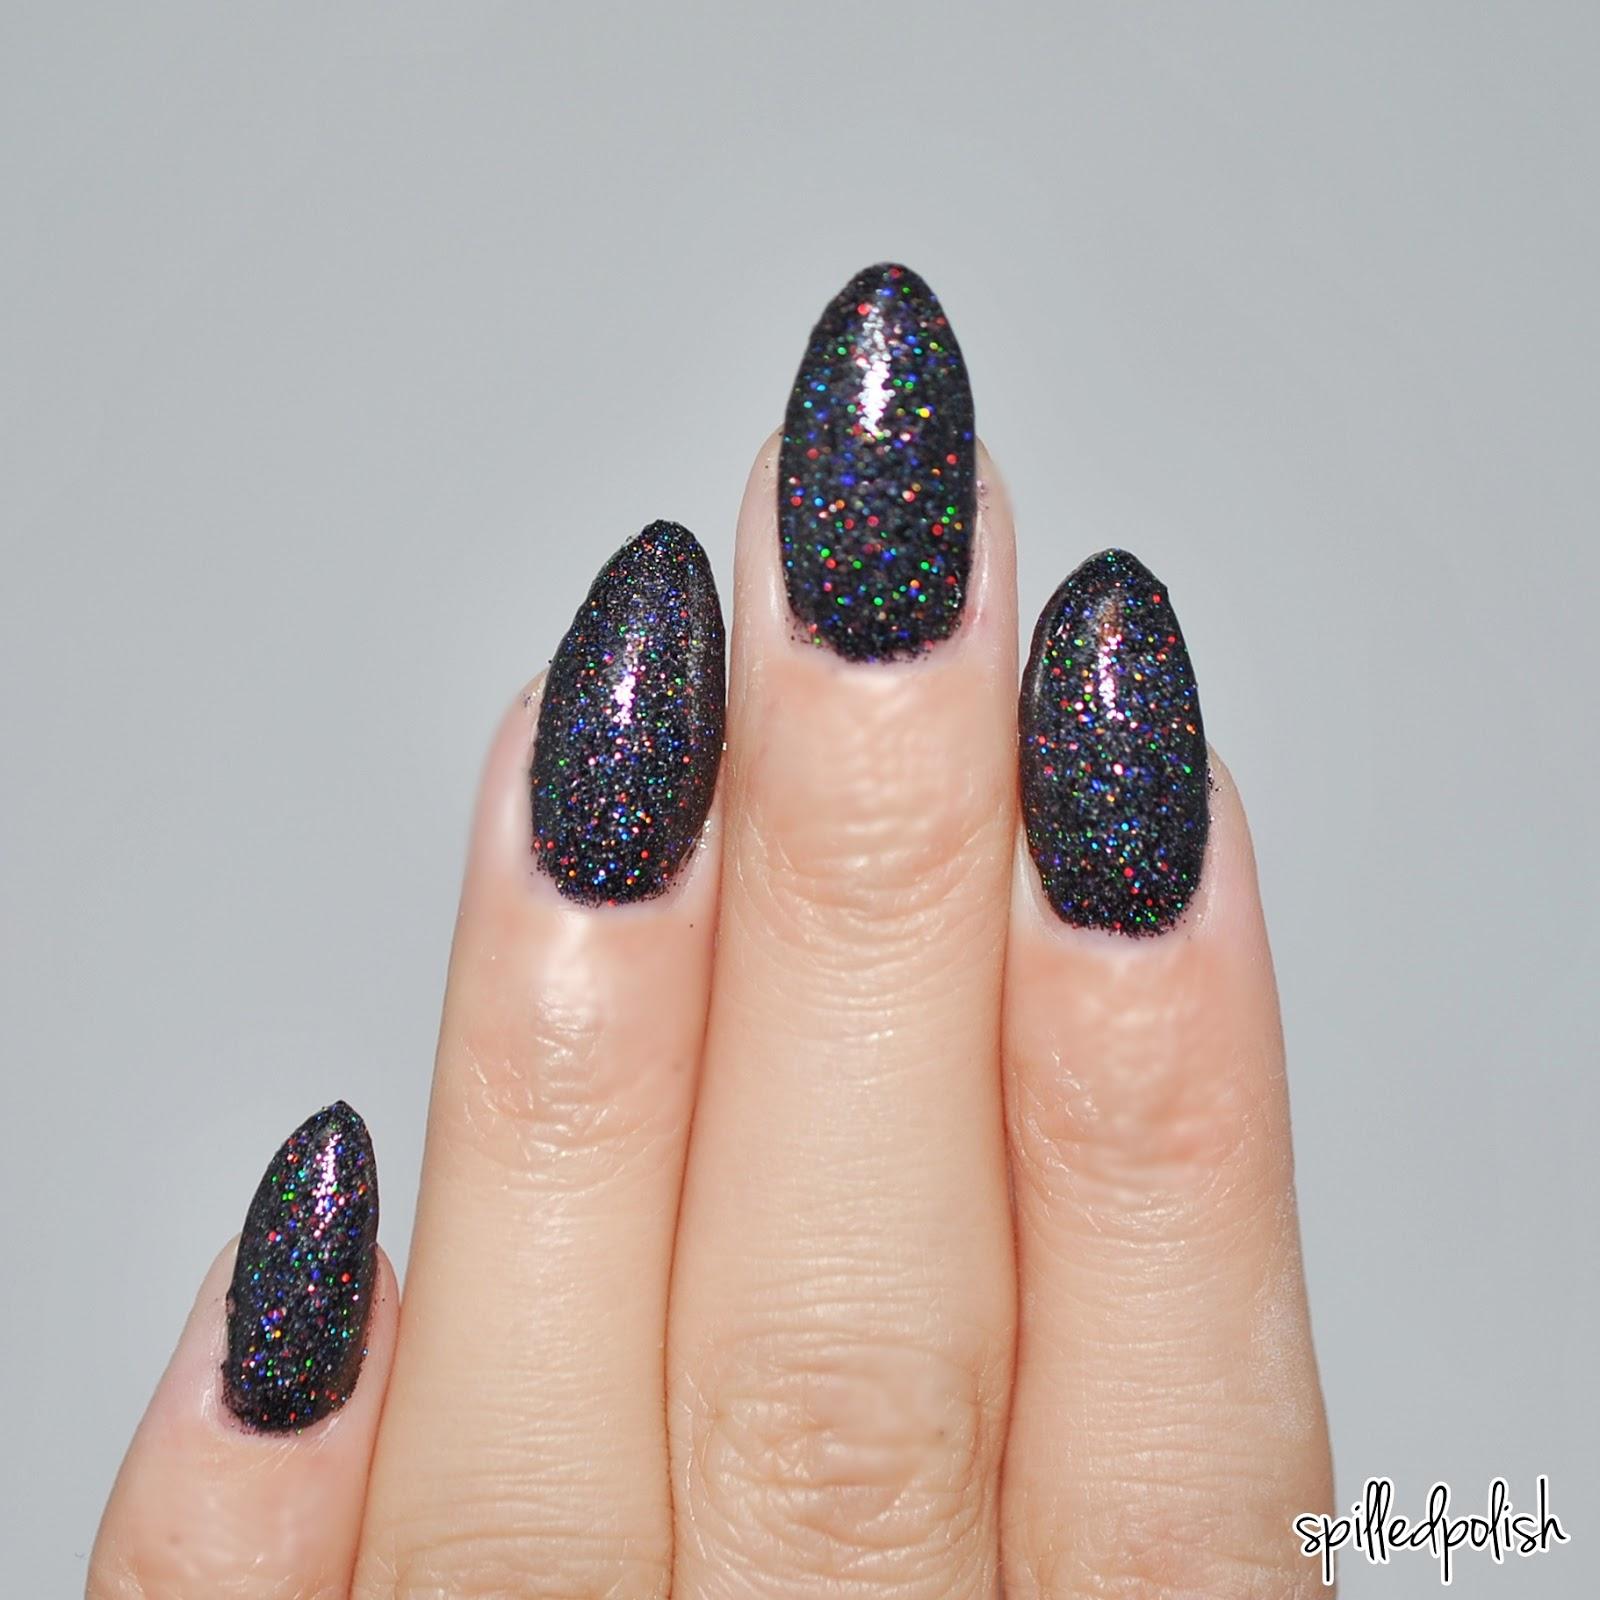 Super Black Holographic Nail Polish Uk: Spilledpolish: Beyond The Nail